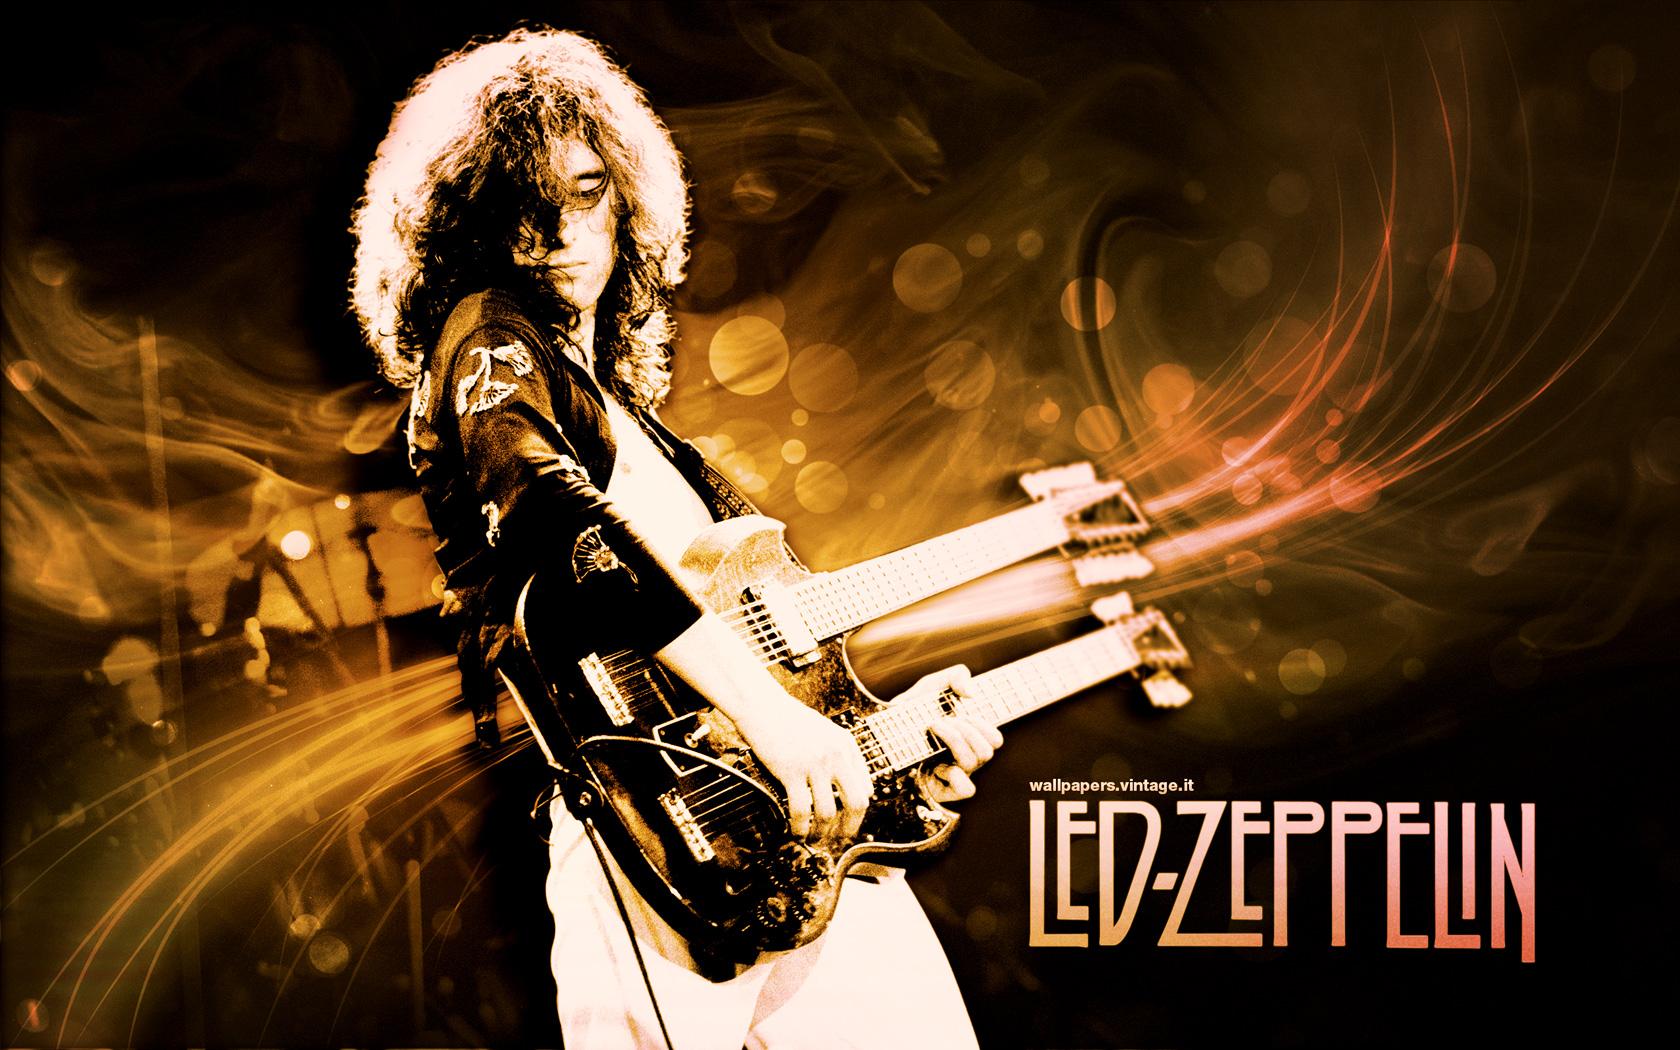 50 Music Wallpaper For Ipad On Wallpapersafari: Led Zeppelin Phone Wallpaper